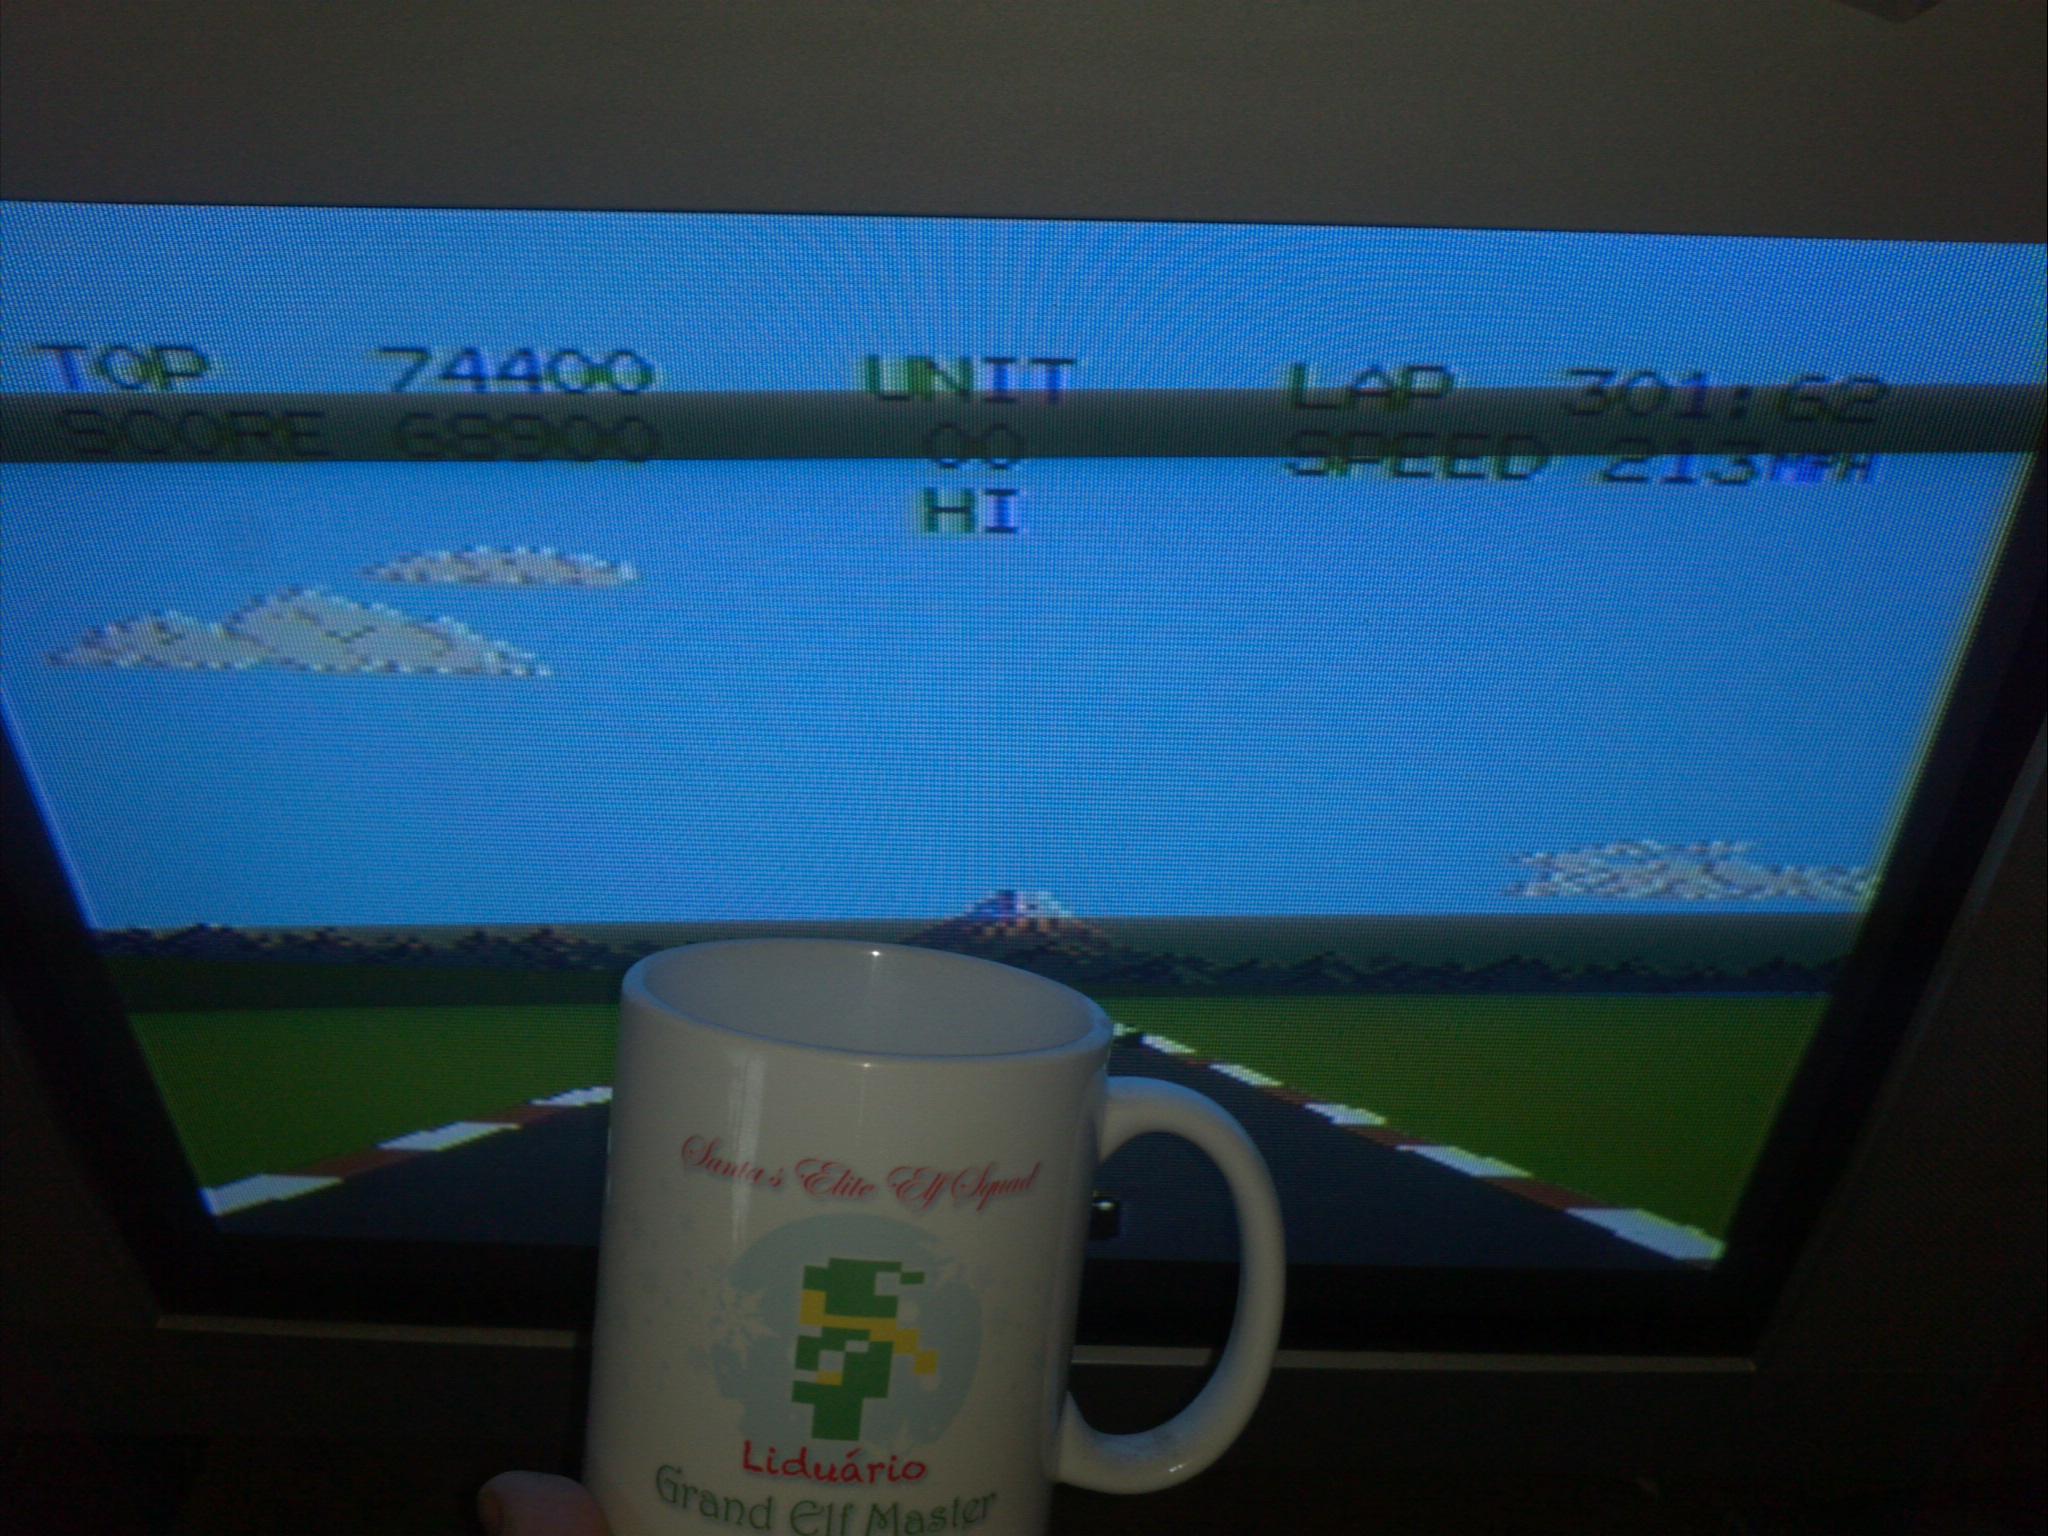 Liduario: Pole Position 2: Fuji (Atari 7800) 74,400 points on 2014-10-19 08:24:55